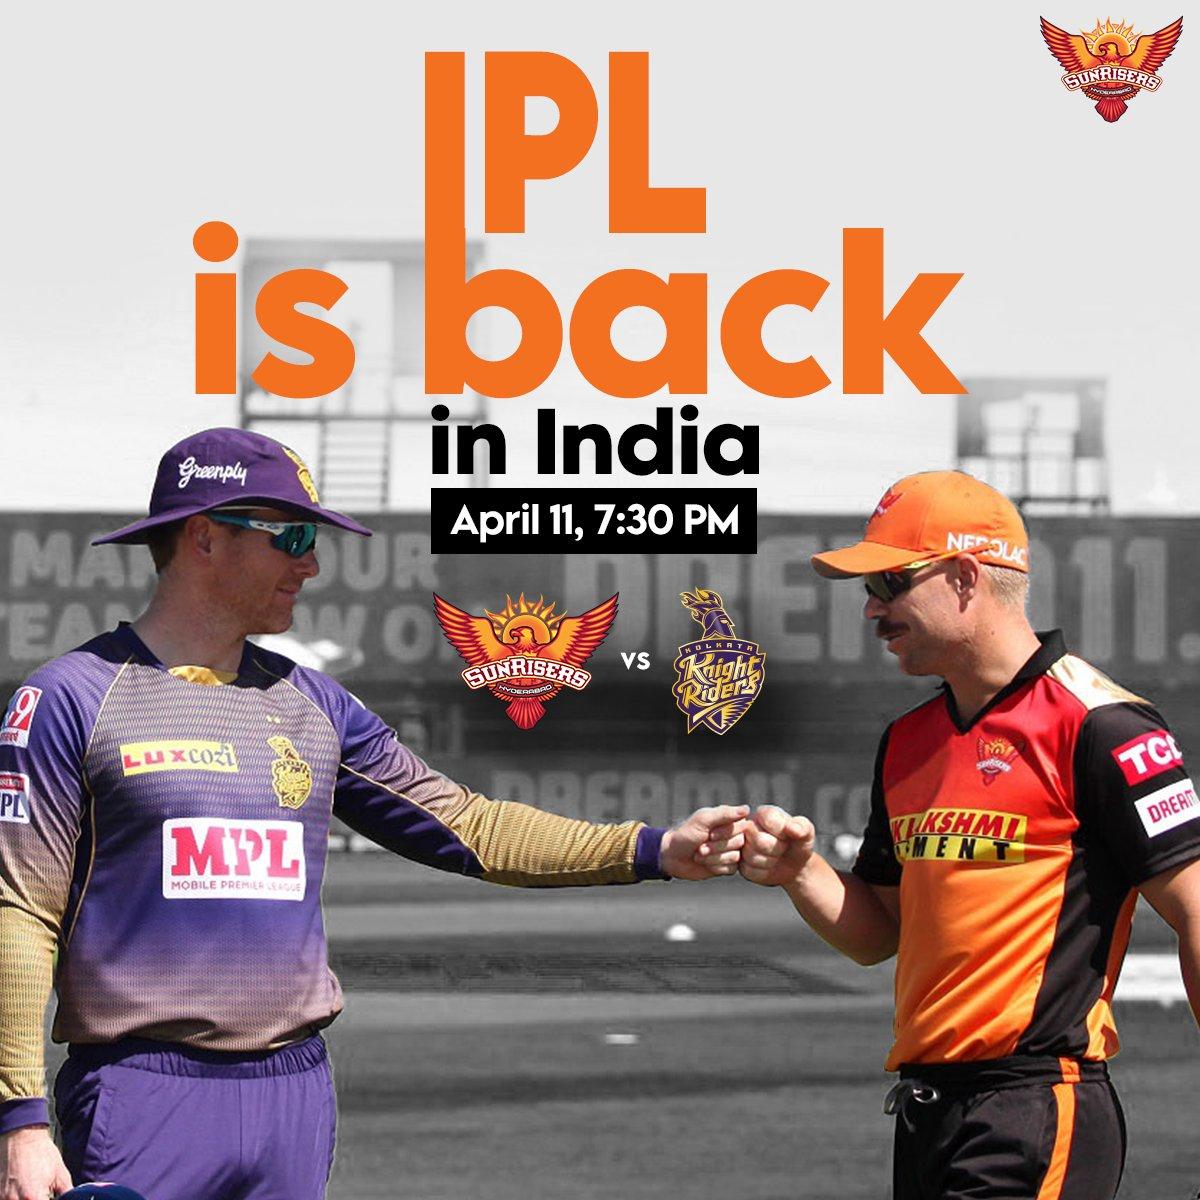 It's a date with @KKRiders 🧡💜  #IPL2021 #OrangeArmy #KeepRising #SRH